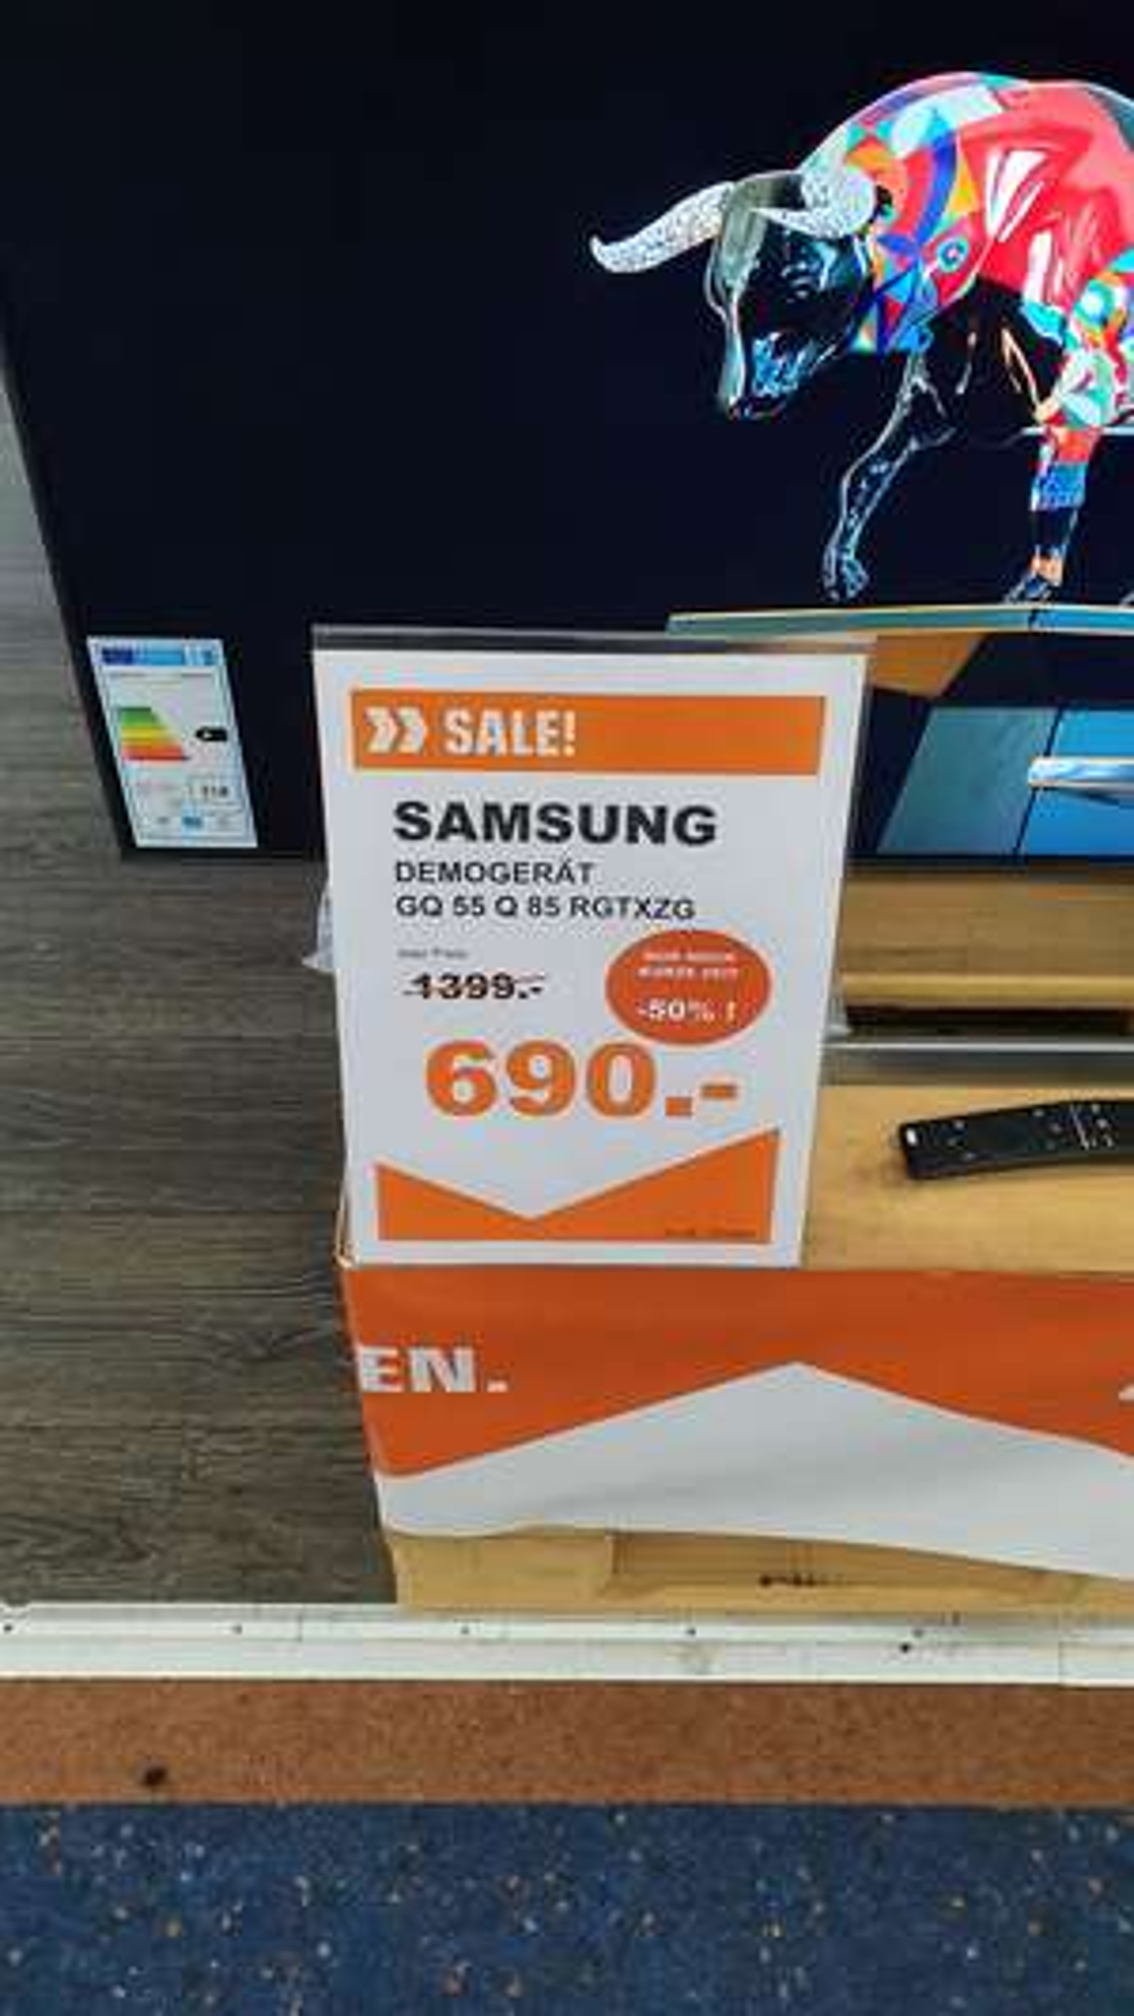 [Lokal Berlin] QLED Fernseher Demogeräte: Samsung 55 Q 85 rgtxzg (Alexanderplatz Saturn)